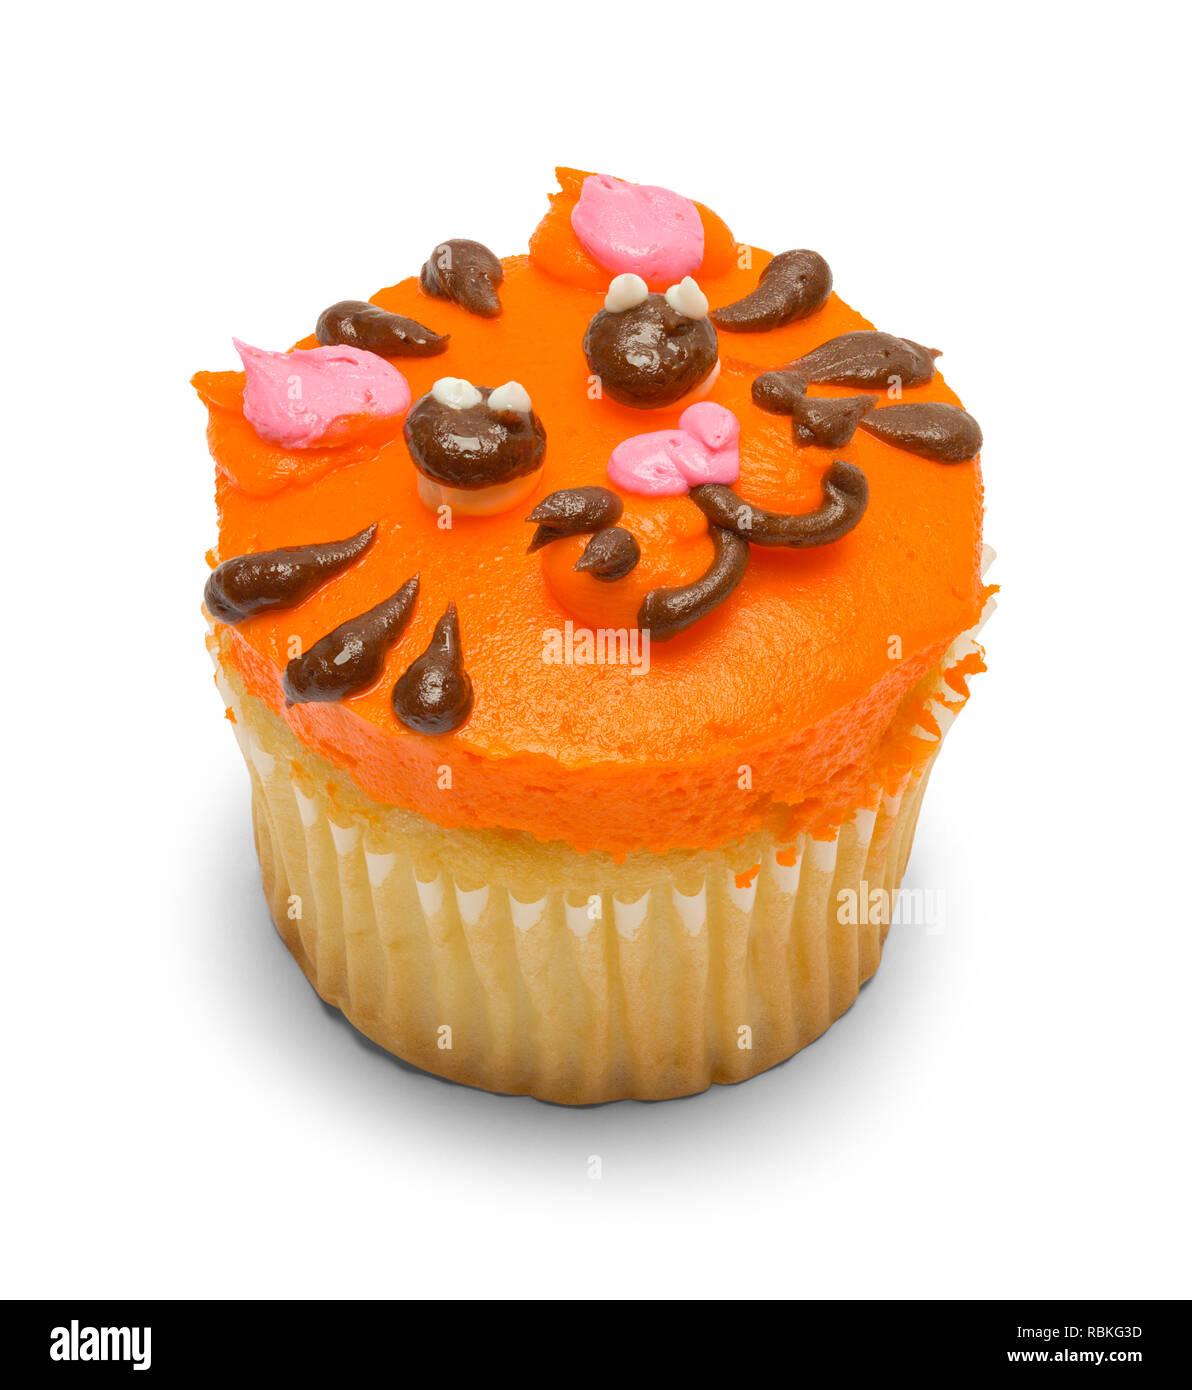 Ornage Tiger Cupcake Isolated on White Background. - Stock Image